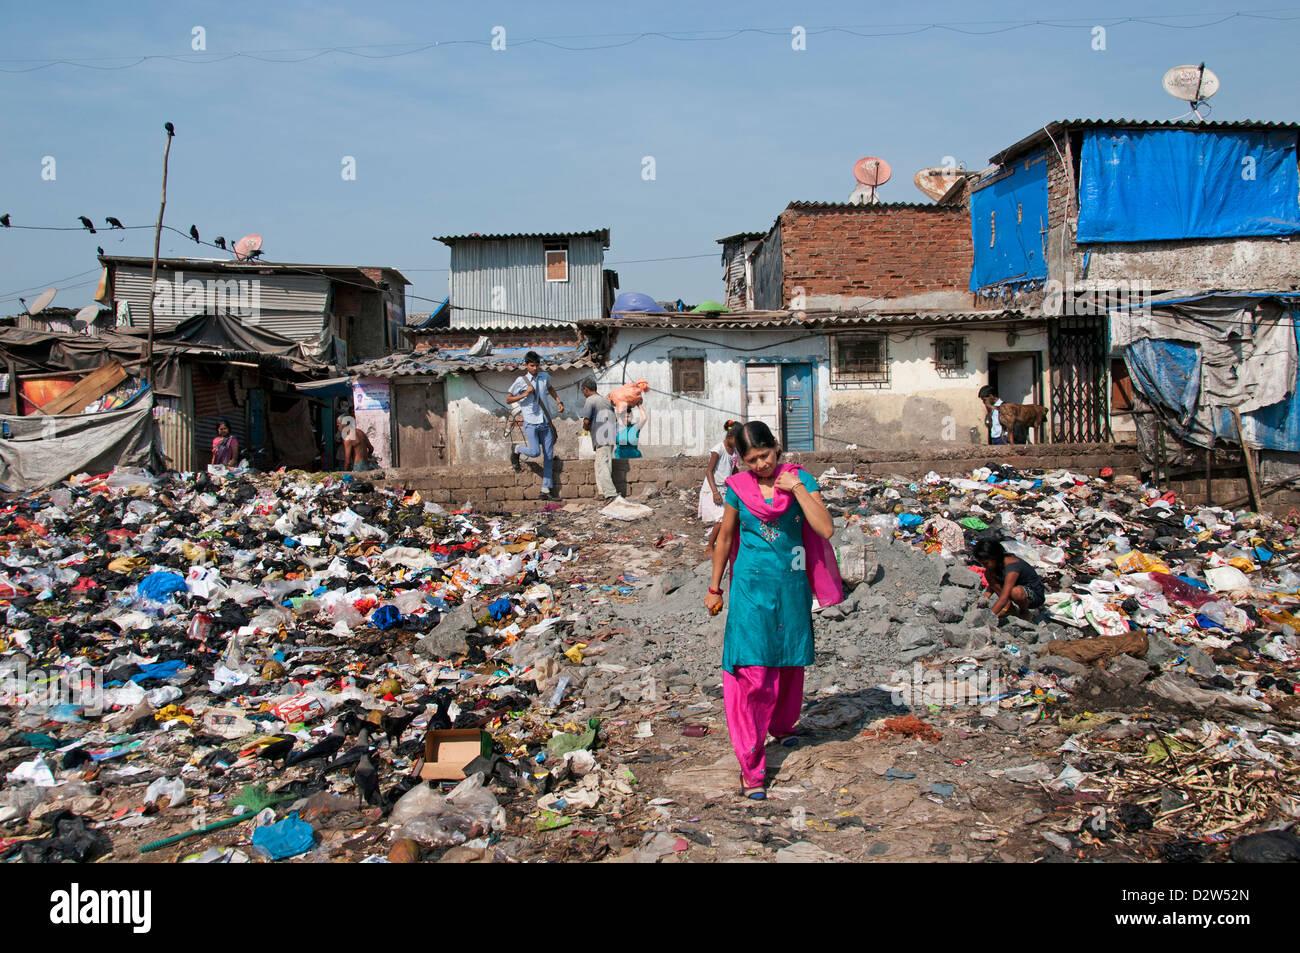 Mumbai  dump ( Bombay ) Slum near Colaba and World Trade Center India - Stock Image